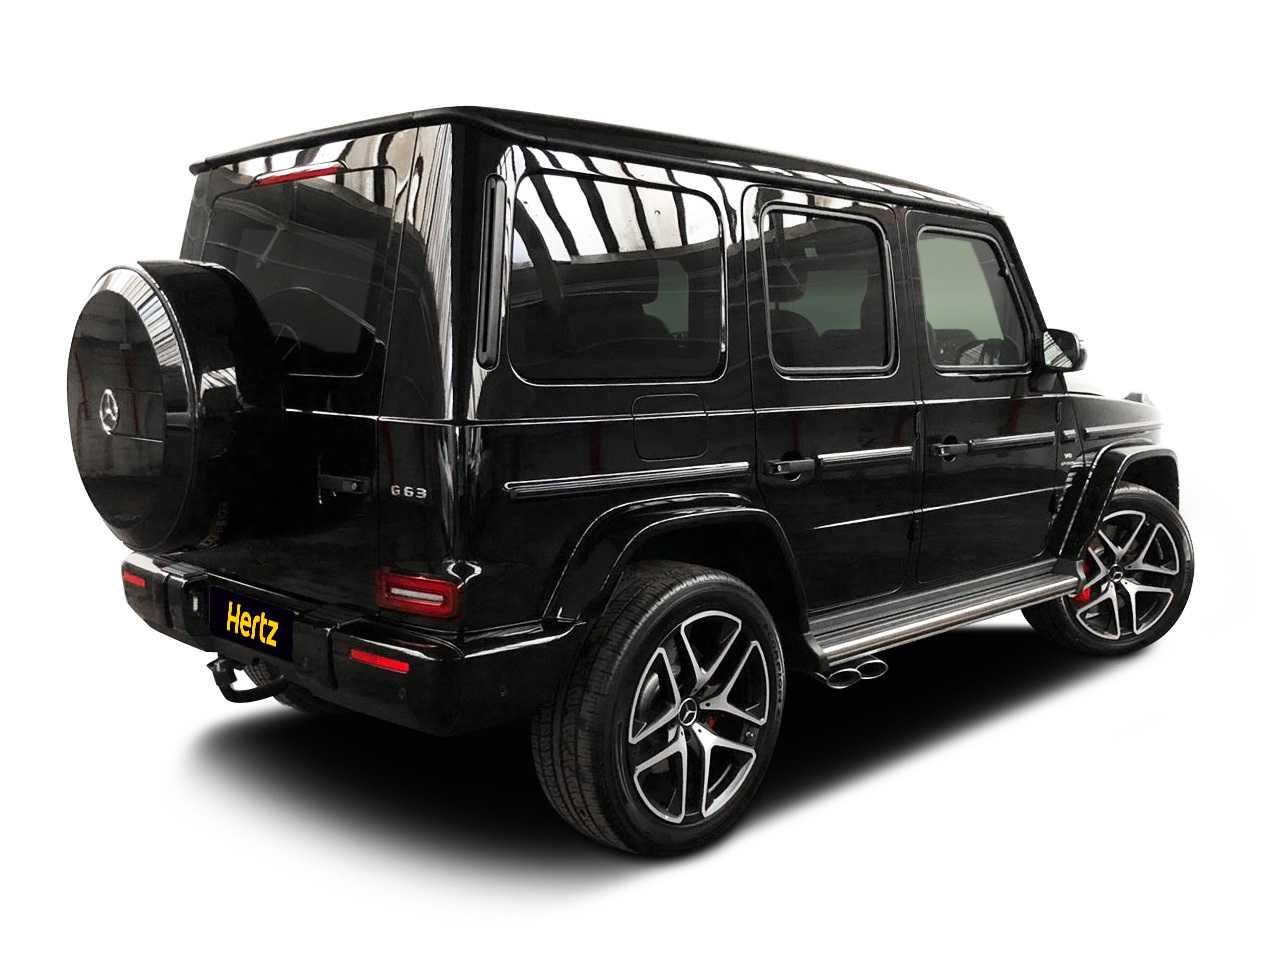 Mercedes G-Wagon 63AMG Car for hire